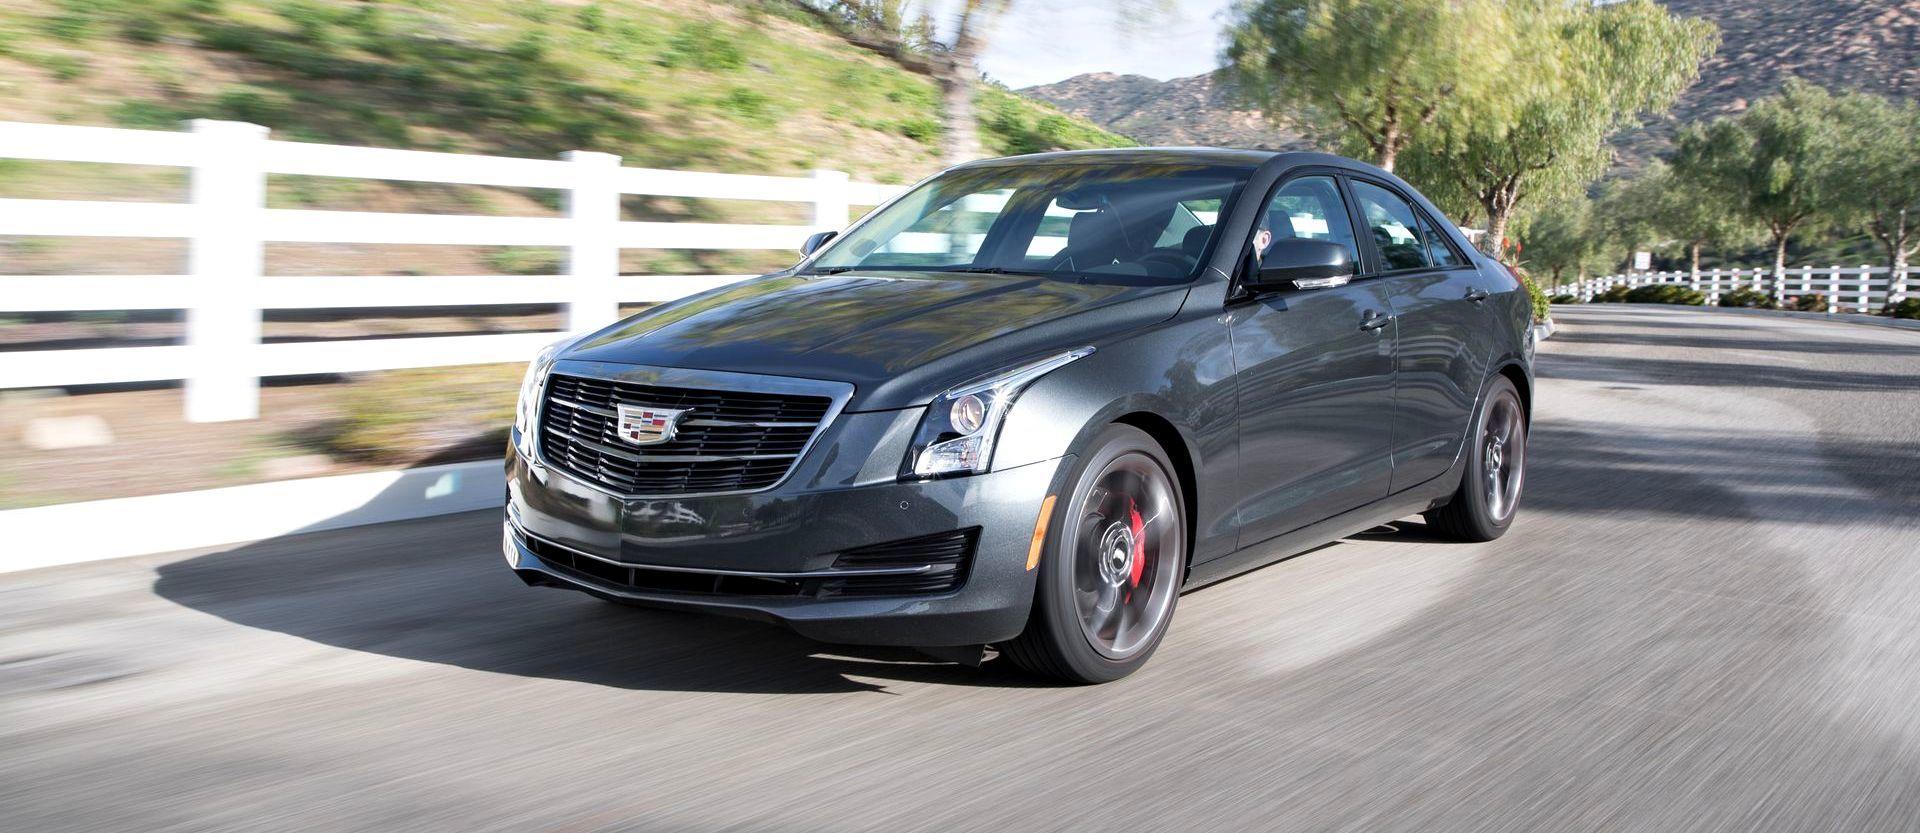 Cadillac Ats Ficha P